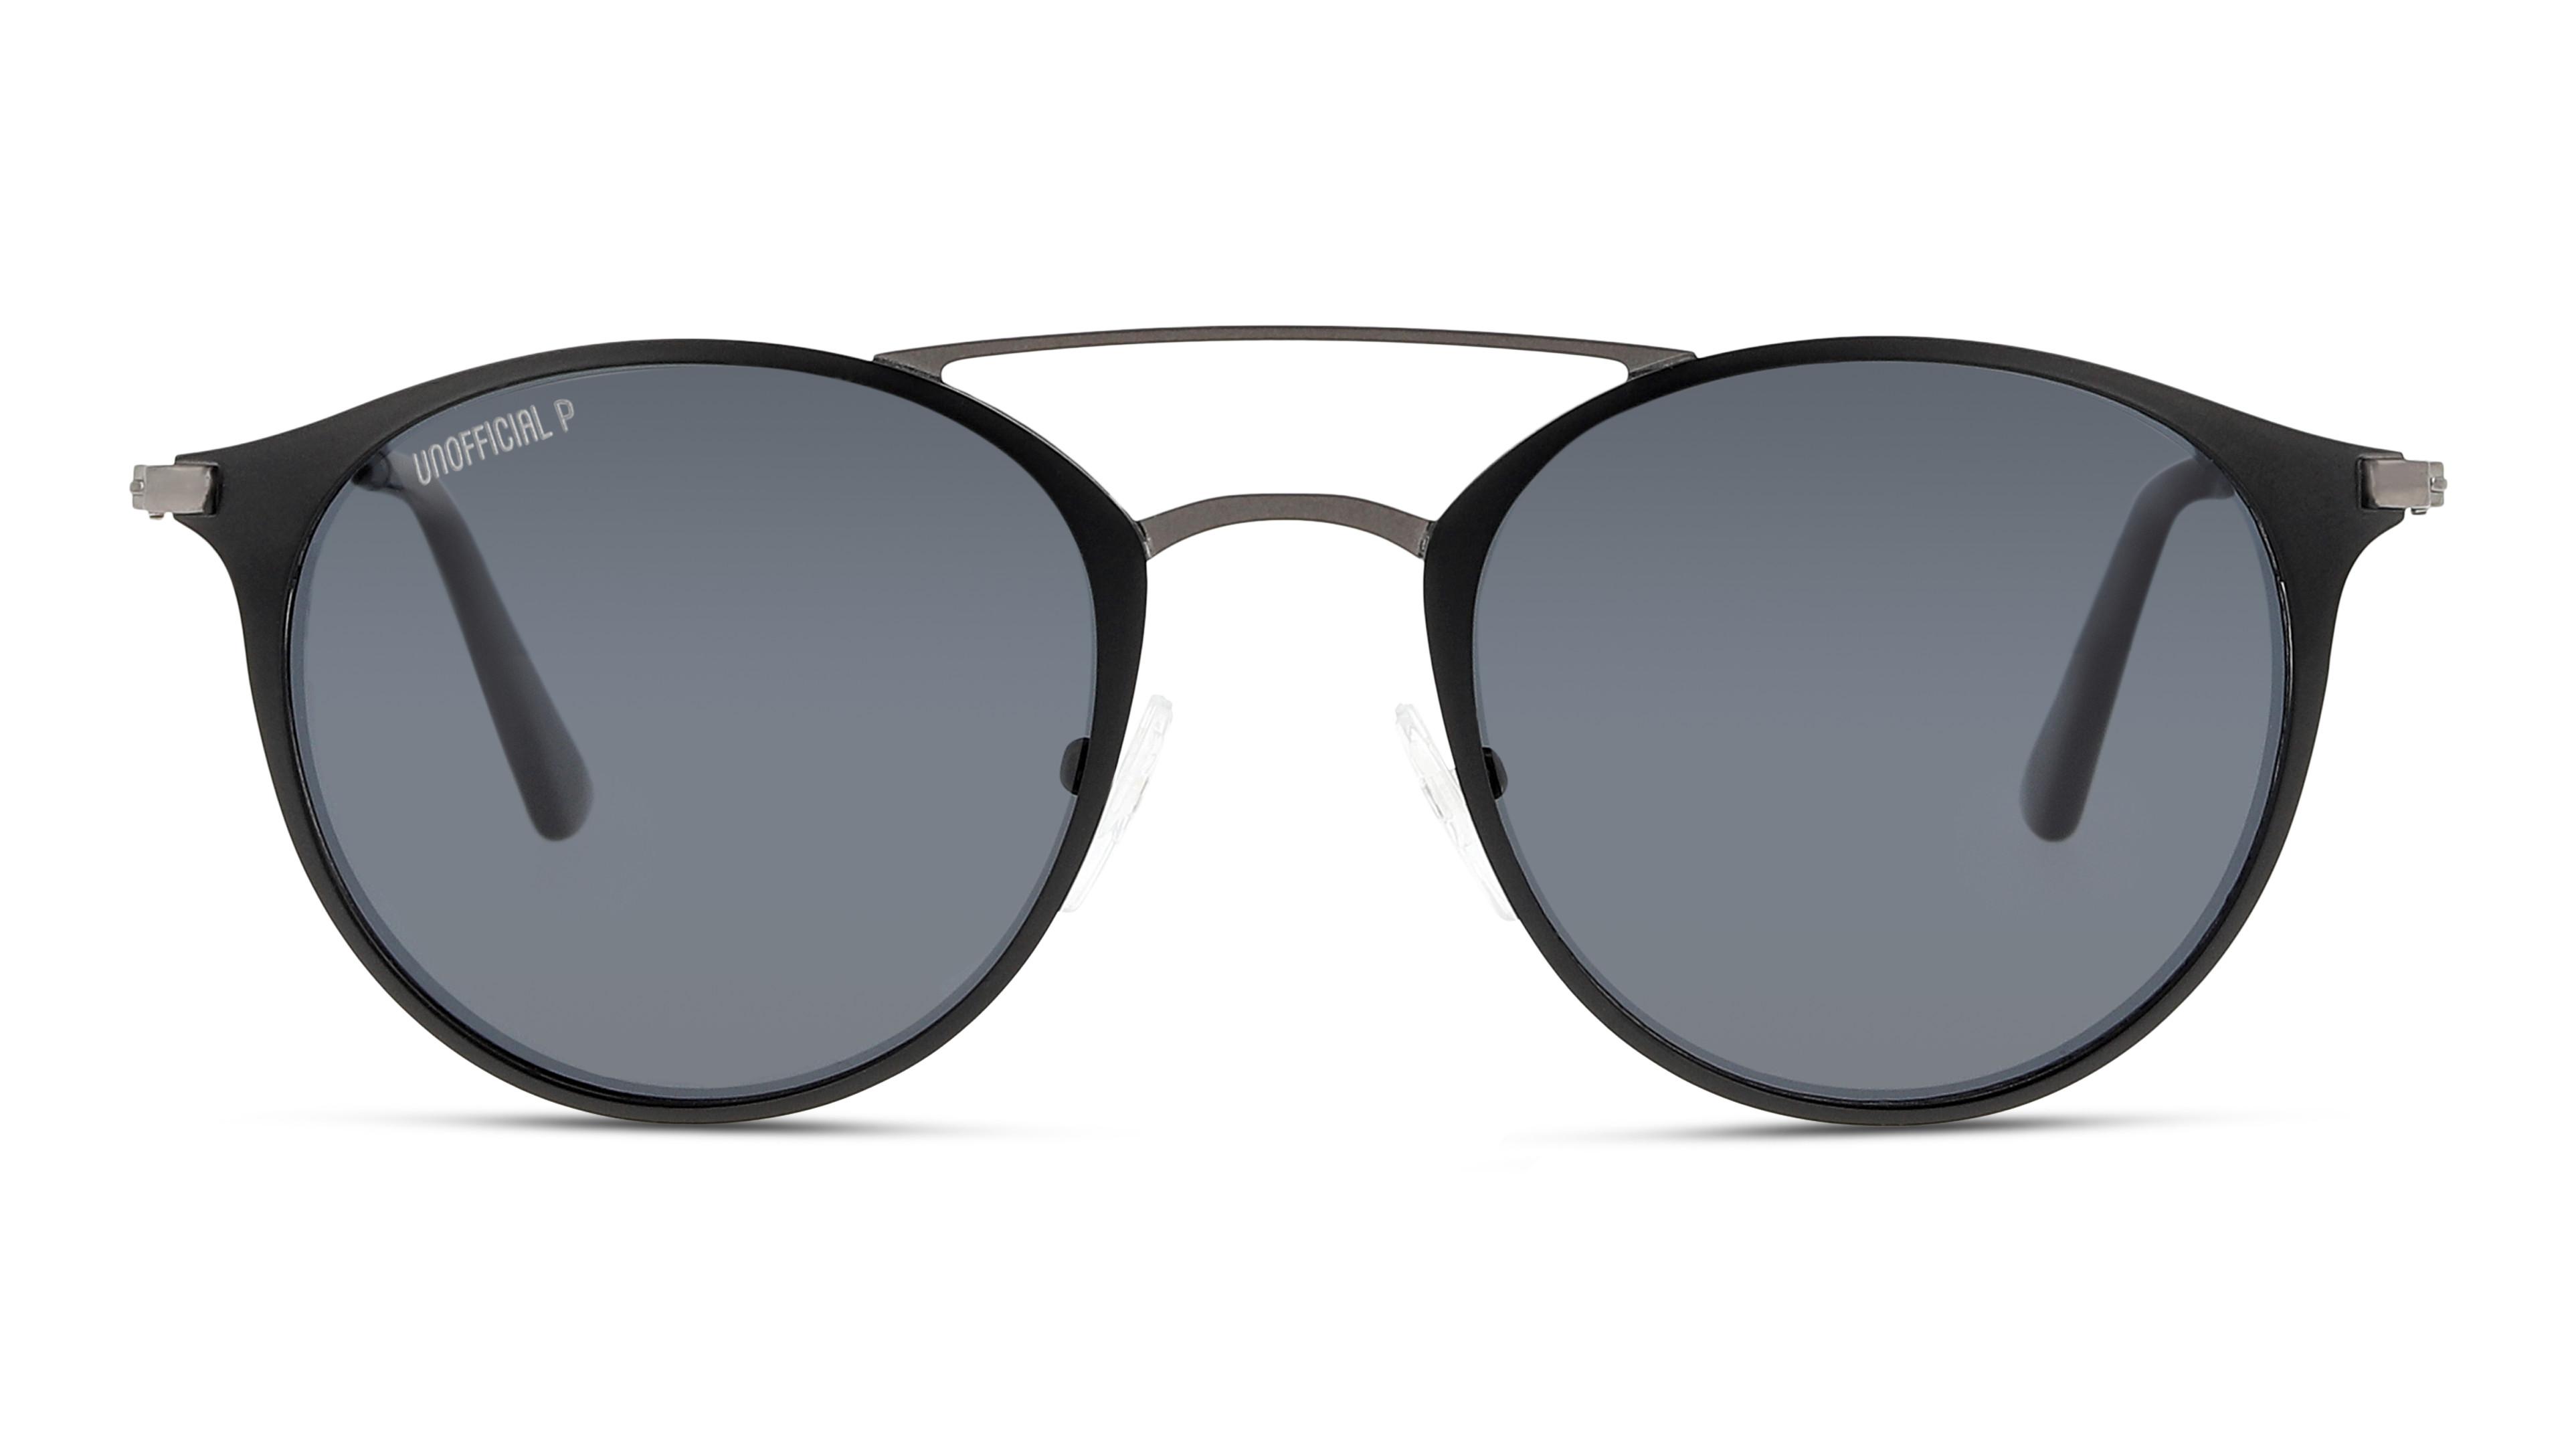 8719154742880-front-01-unofficial-unsu0029p-eyewear-black-grey